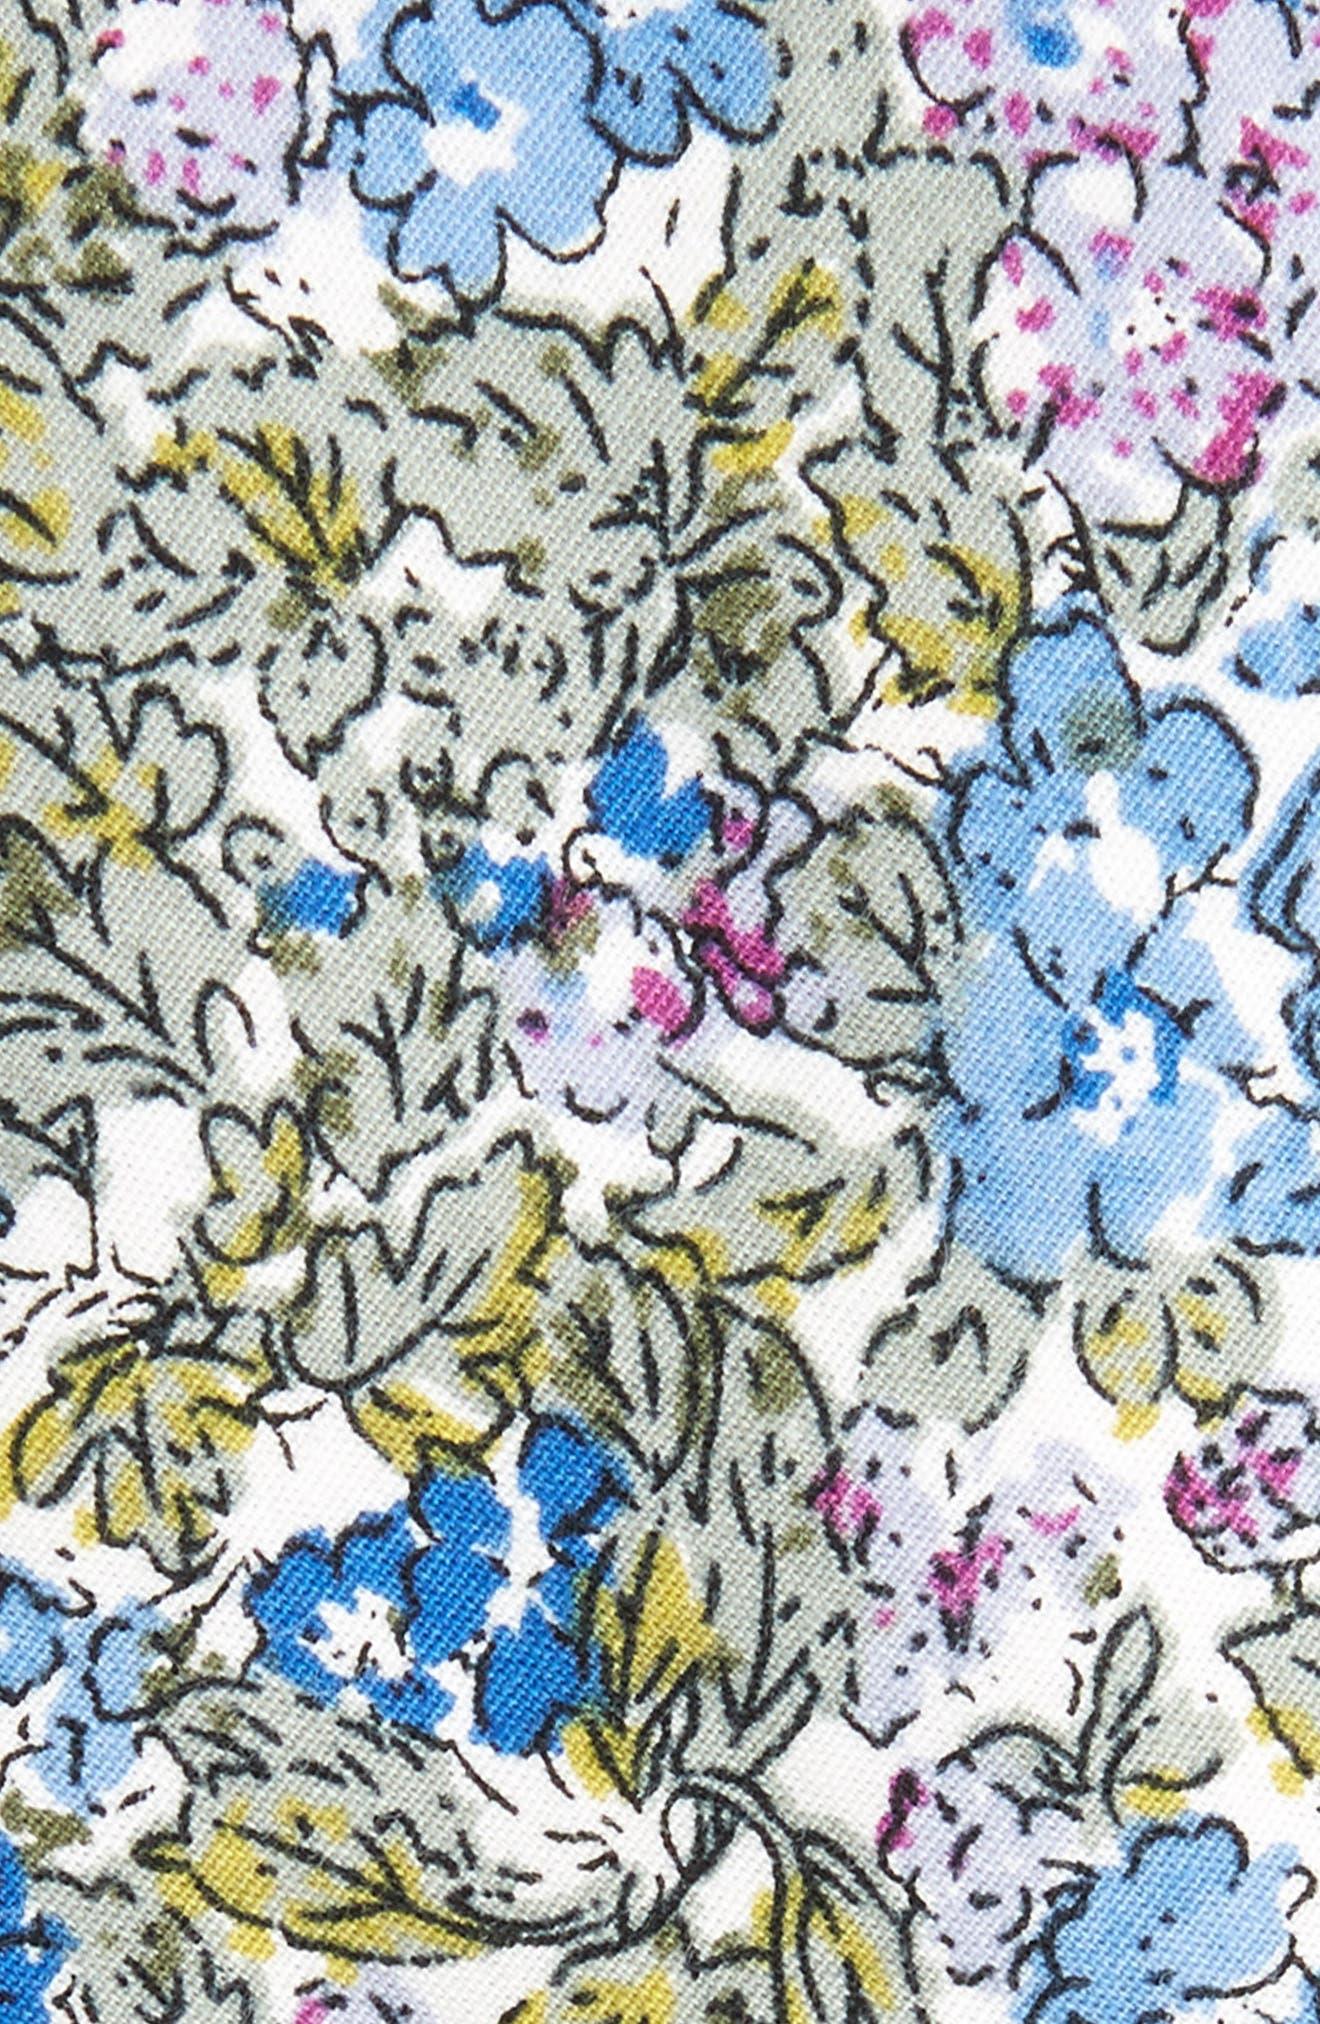 Raglan Floral Cotton Skinny Tie,                             Alternate thumbnail 2, color,                             400